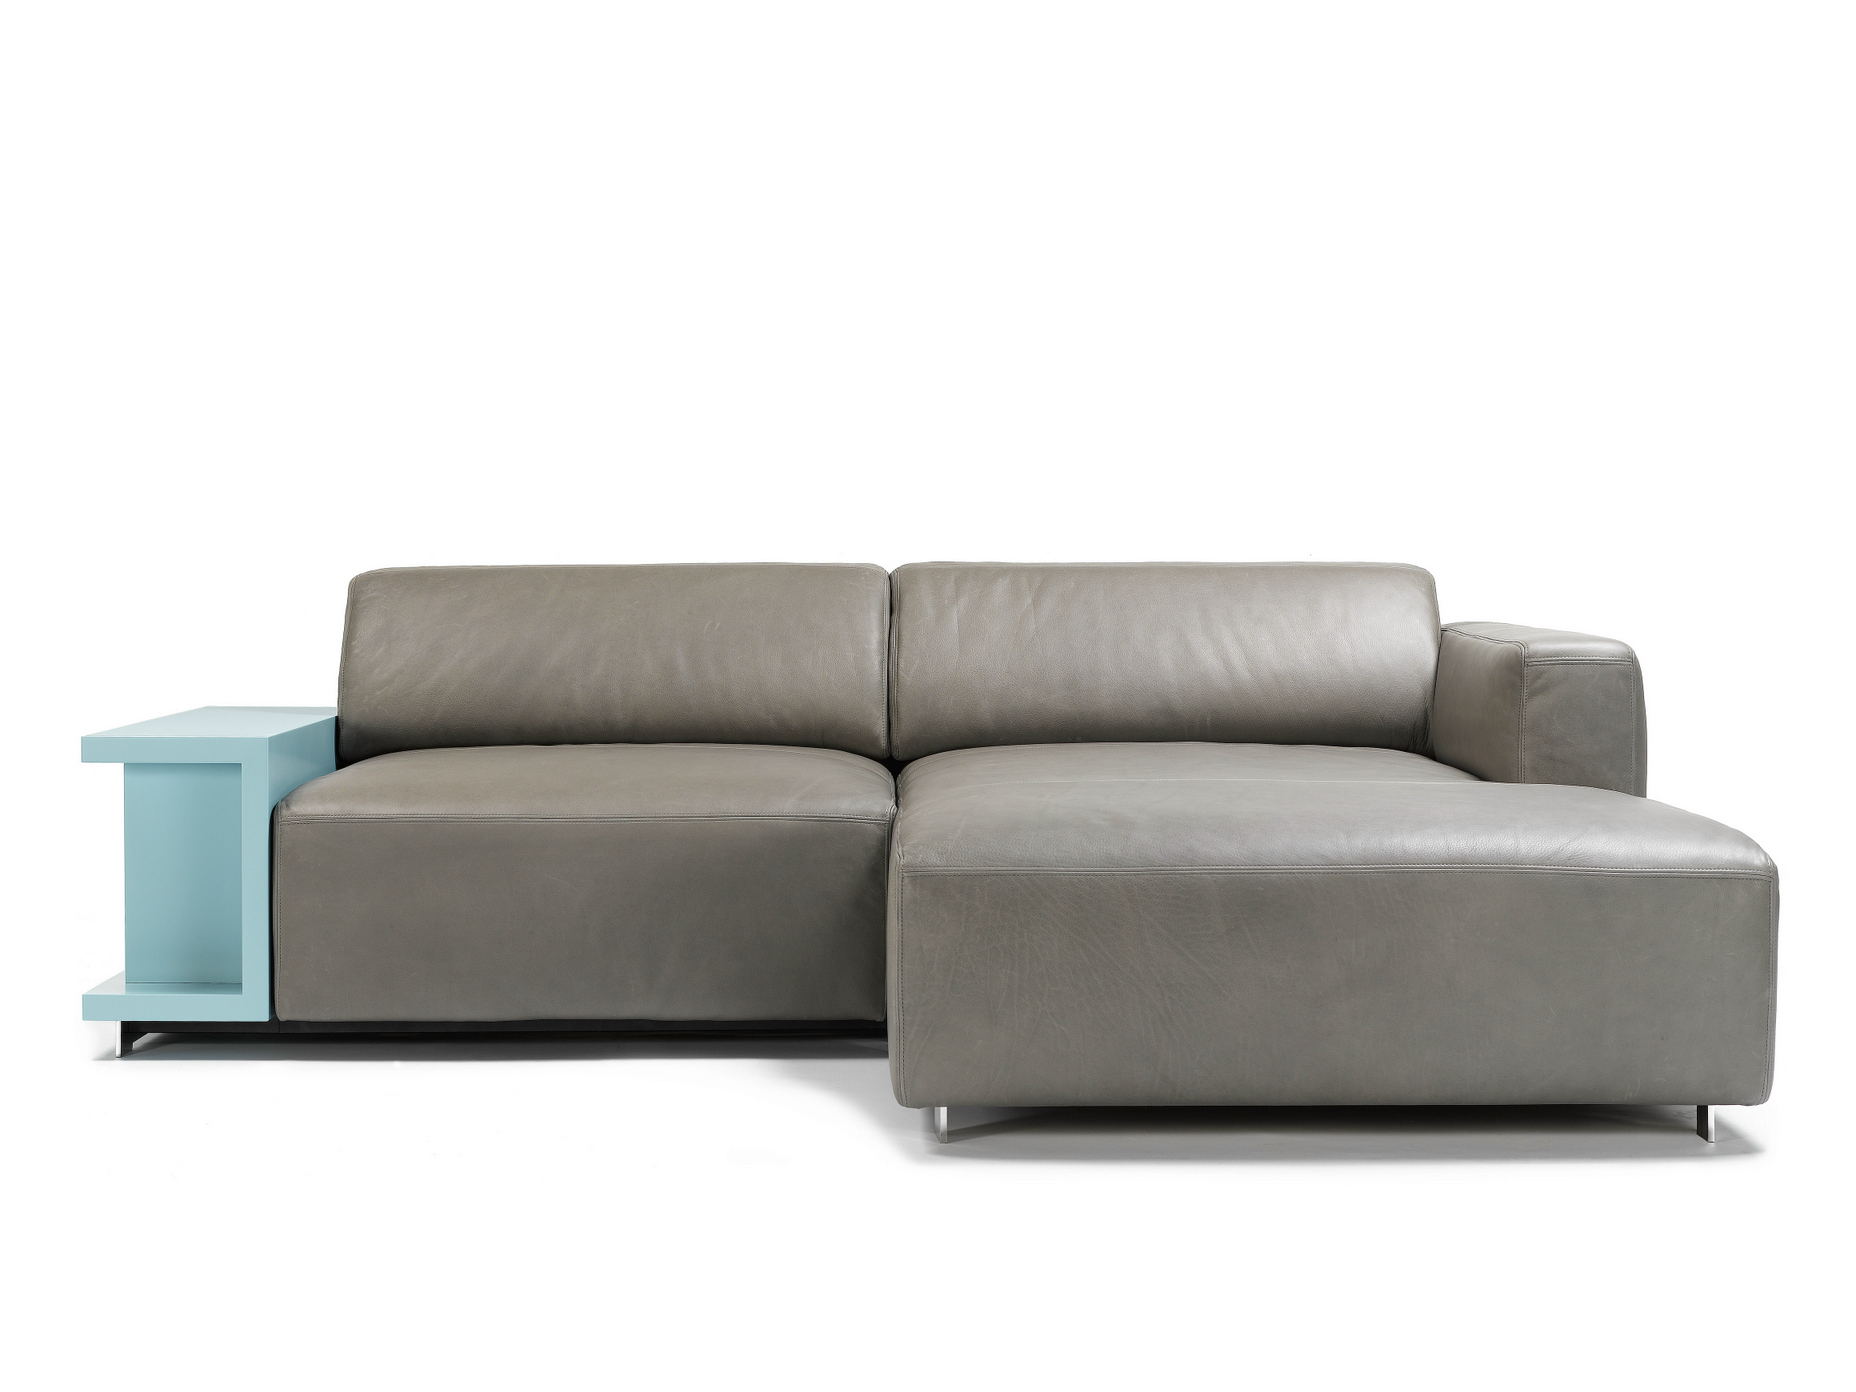 Superb Long Island Sofa By Kai Stania For Durlet Sohomod Blog Spiritservingveterans Wood Chair Design Ideas Spiritservingveteransorg